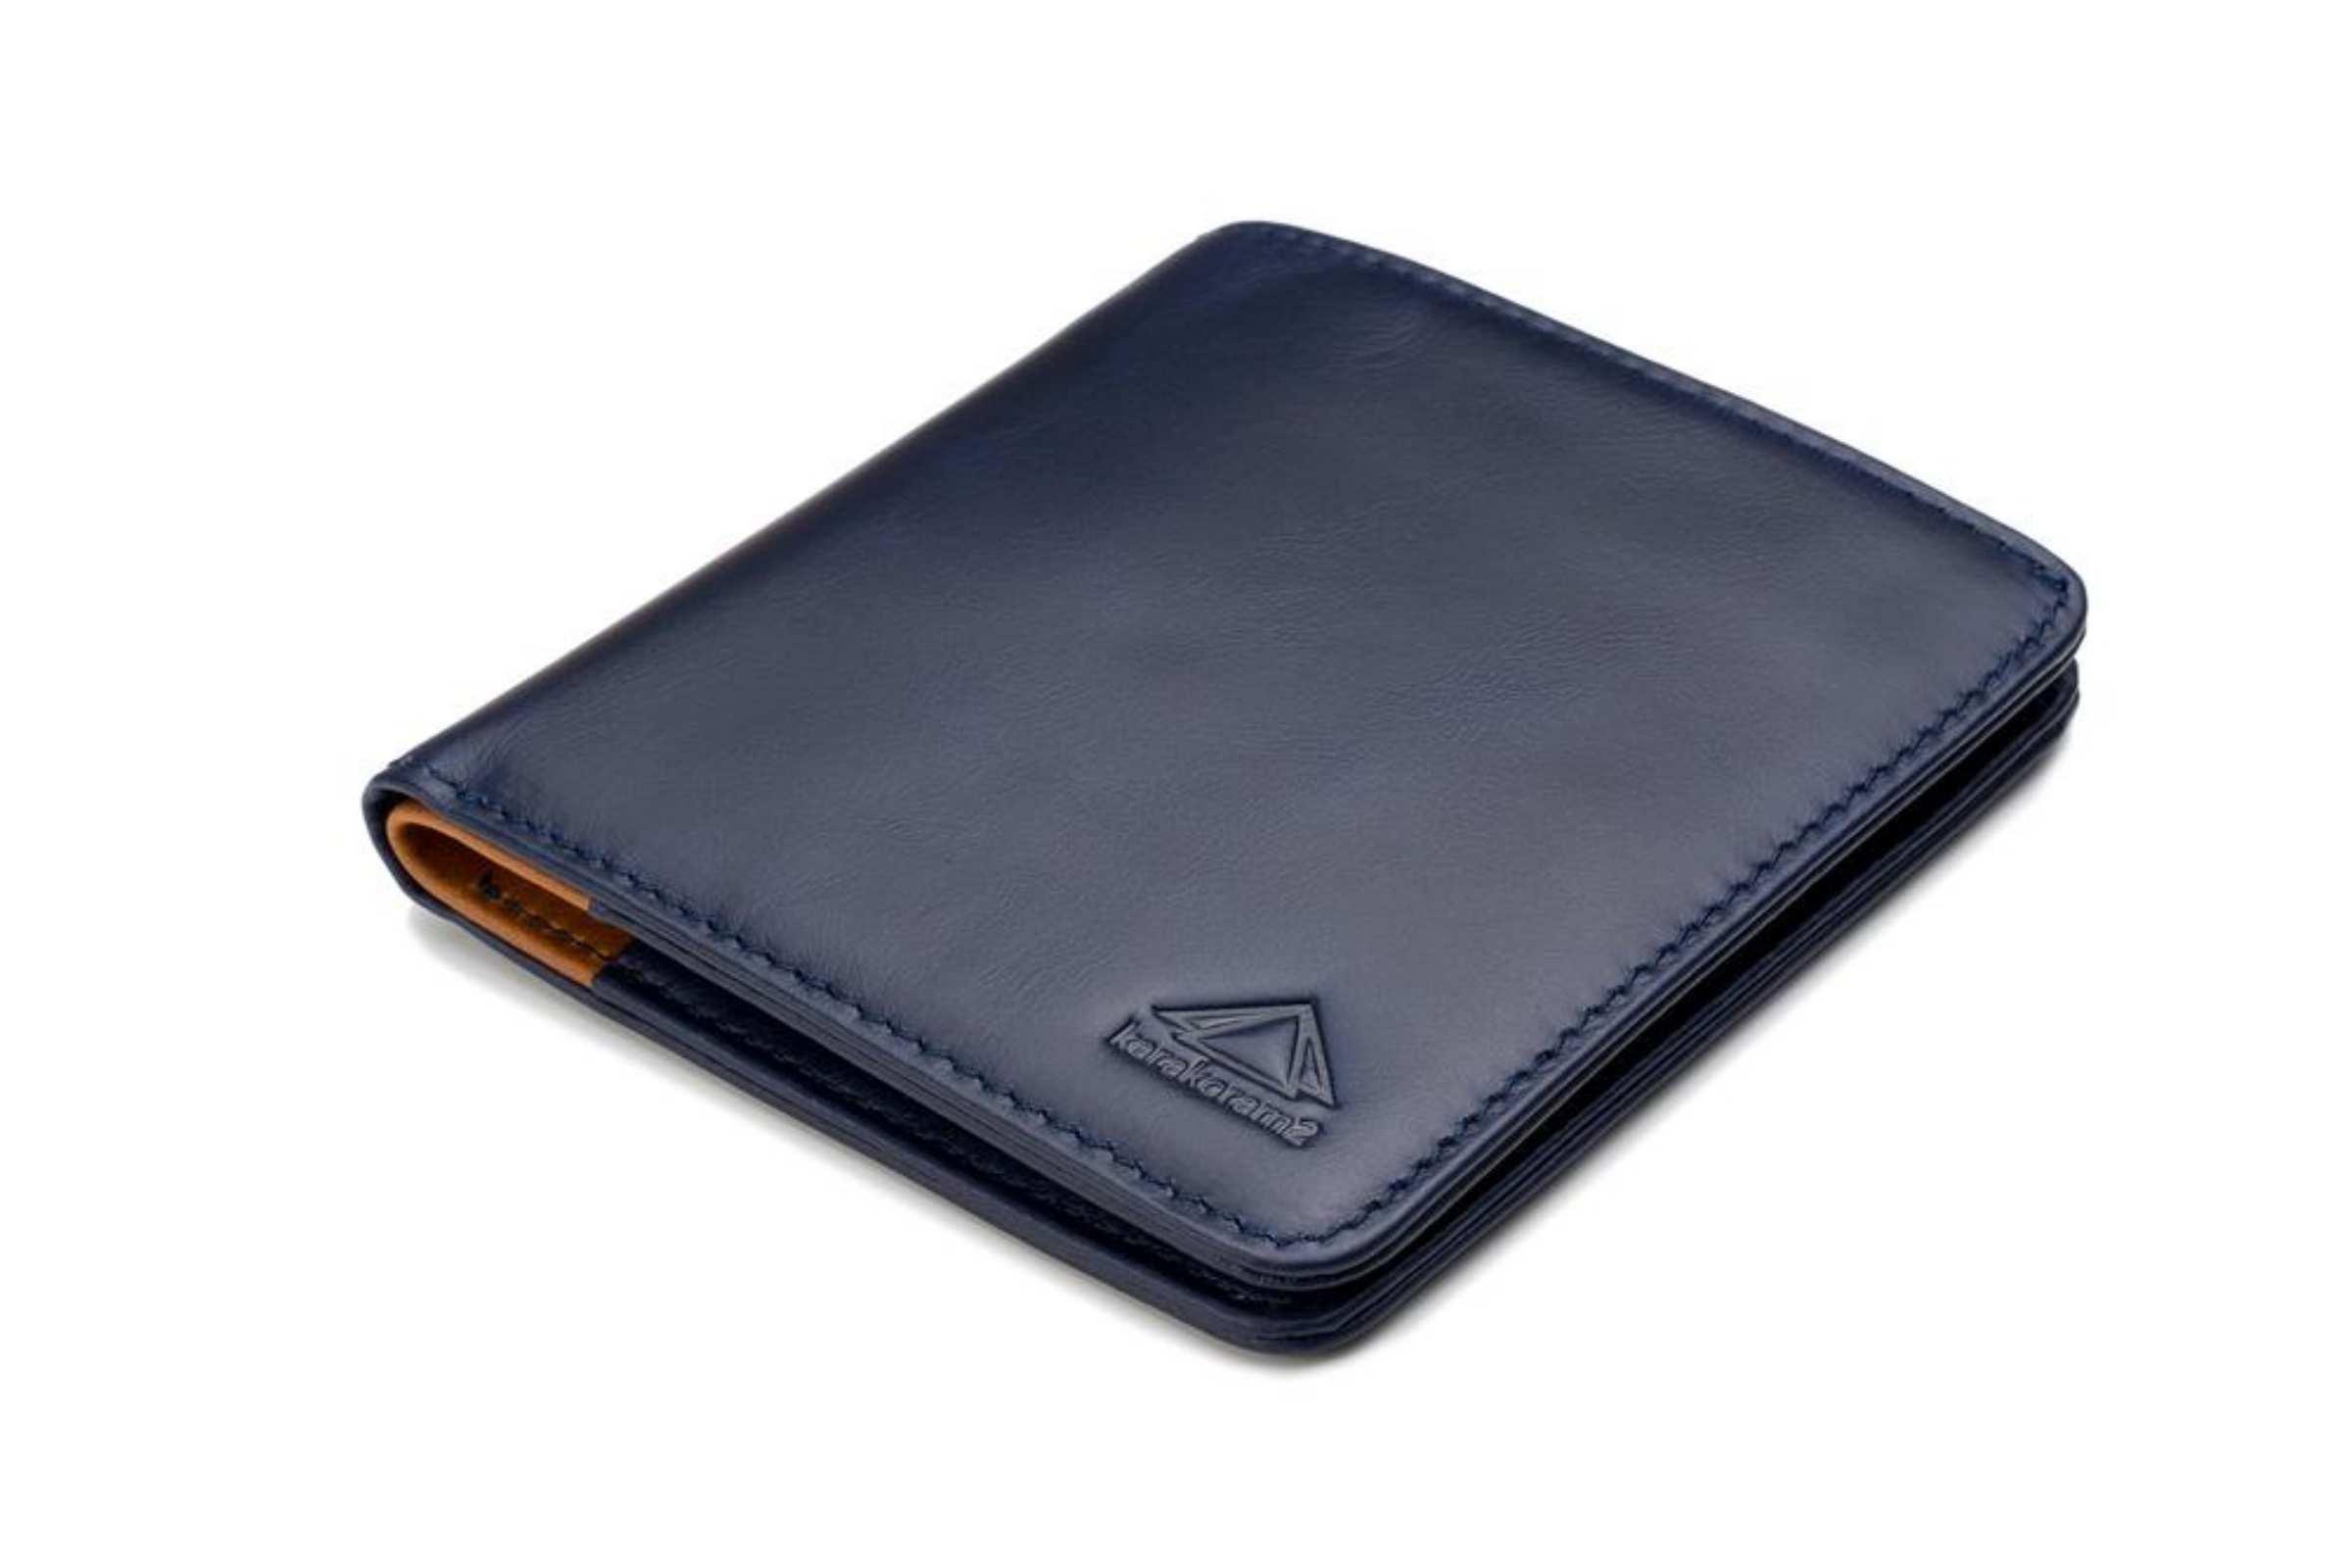 karakoram2 Sublime mens bifold leather wallet pulltab Navy blue RFID protected Australia 2